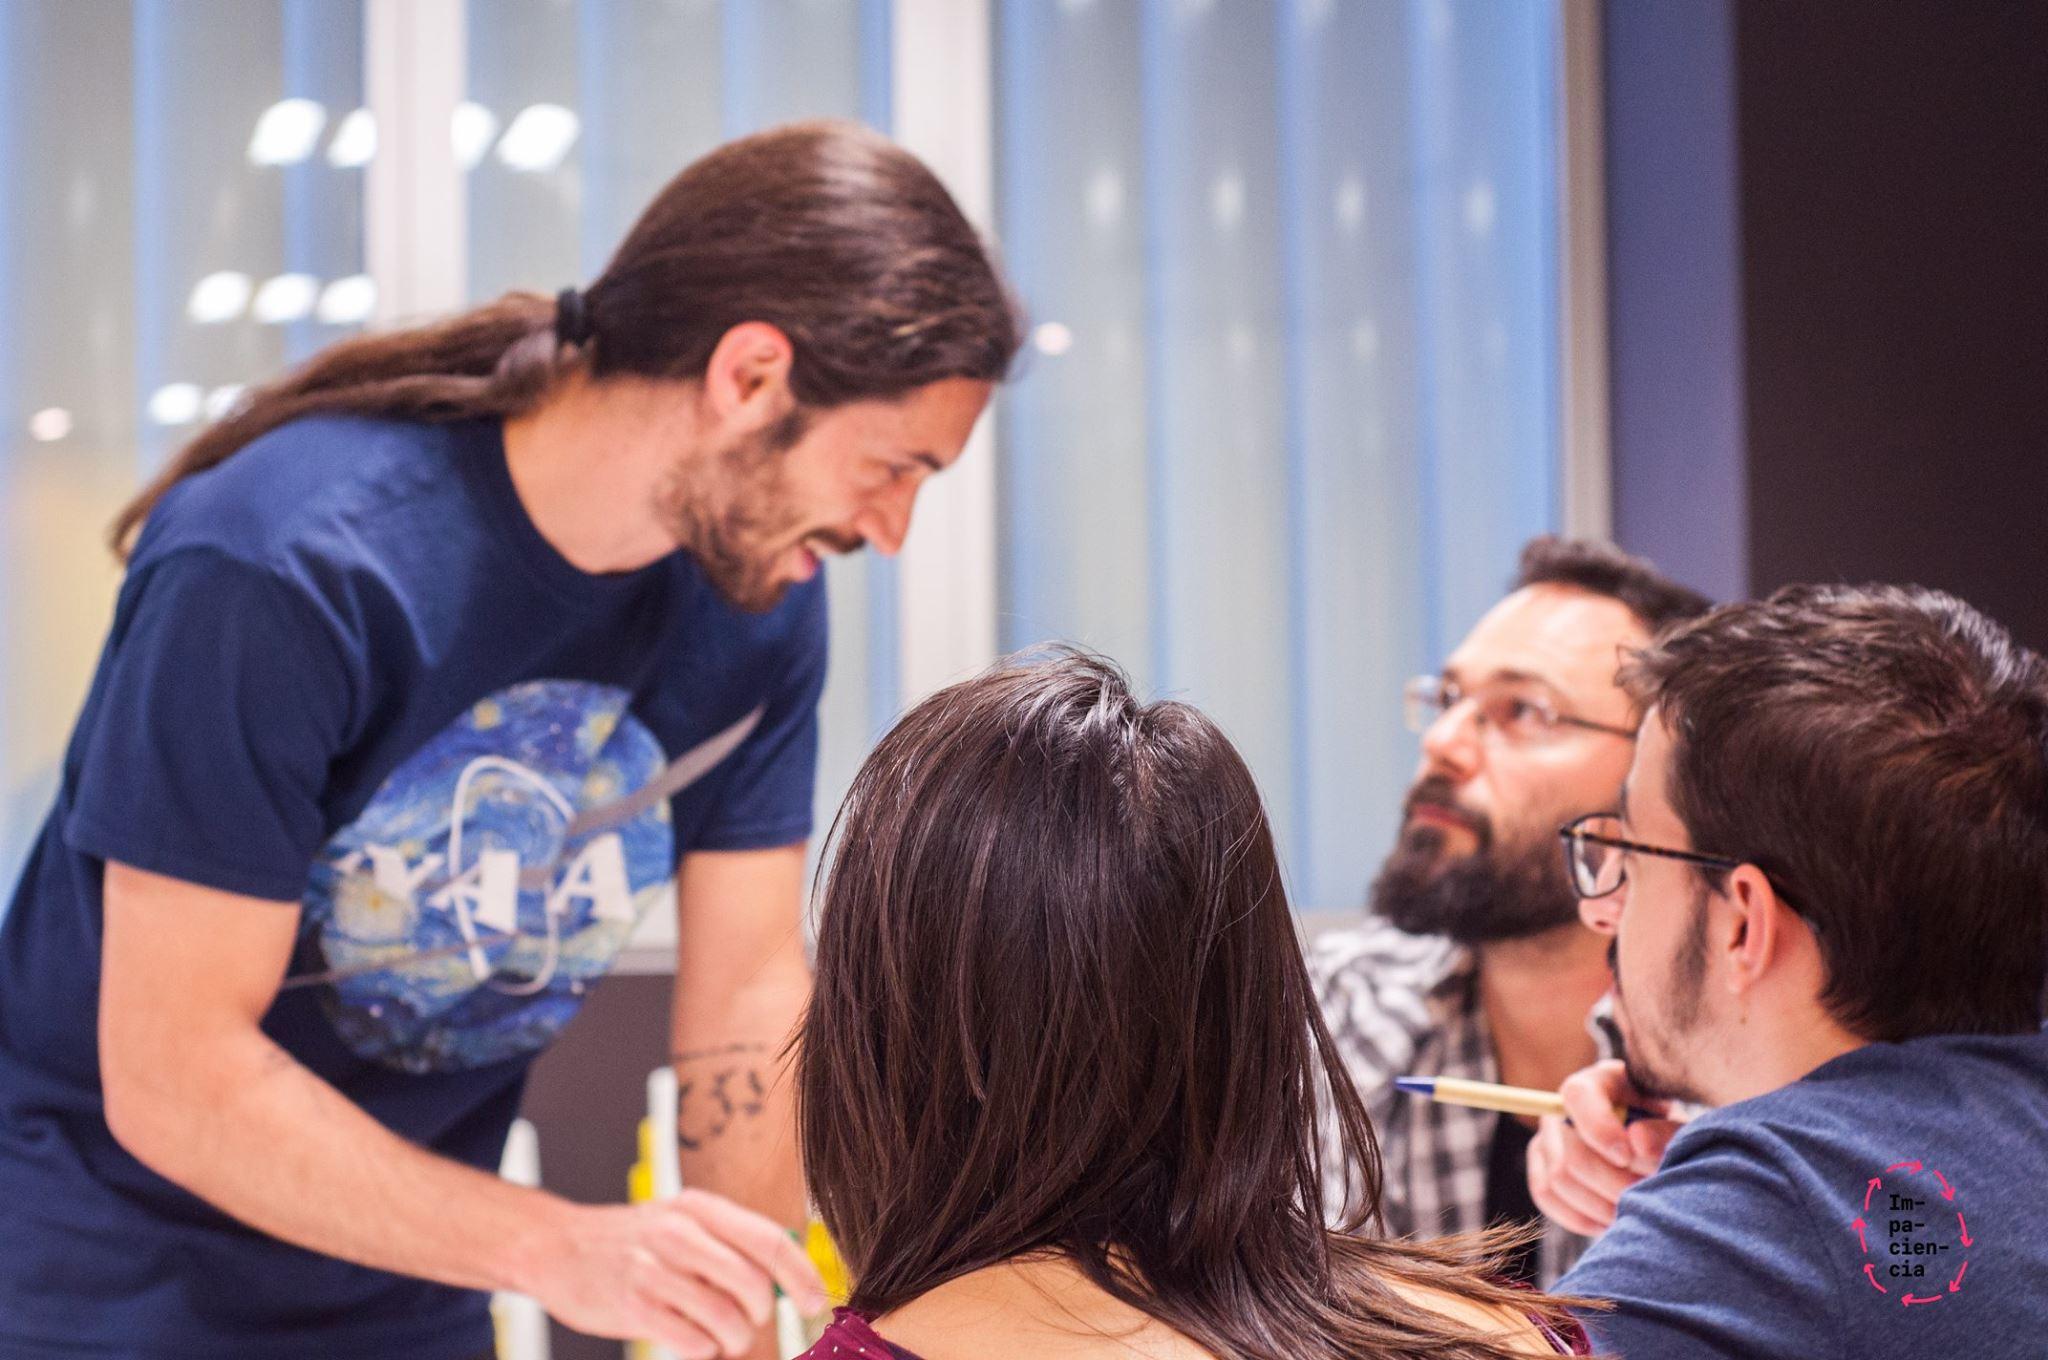 Universidades andaluzas lanzan un concurso para promover proyectos de investigación entre estudiantes